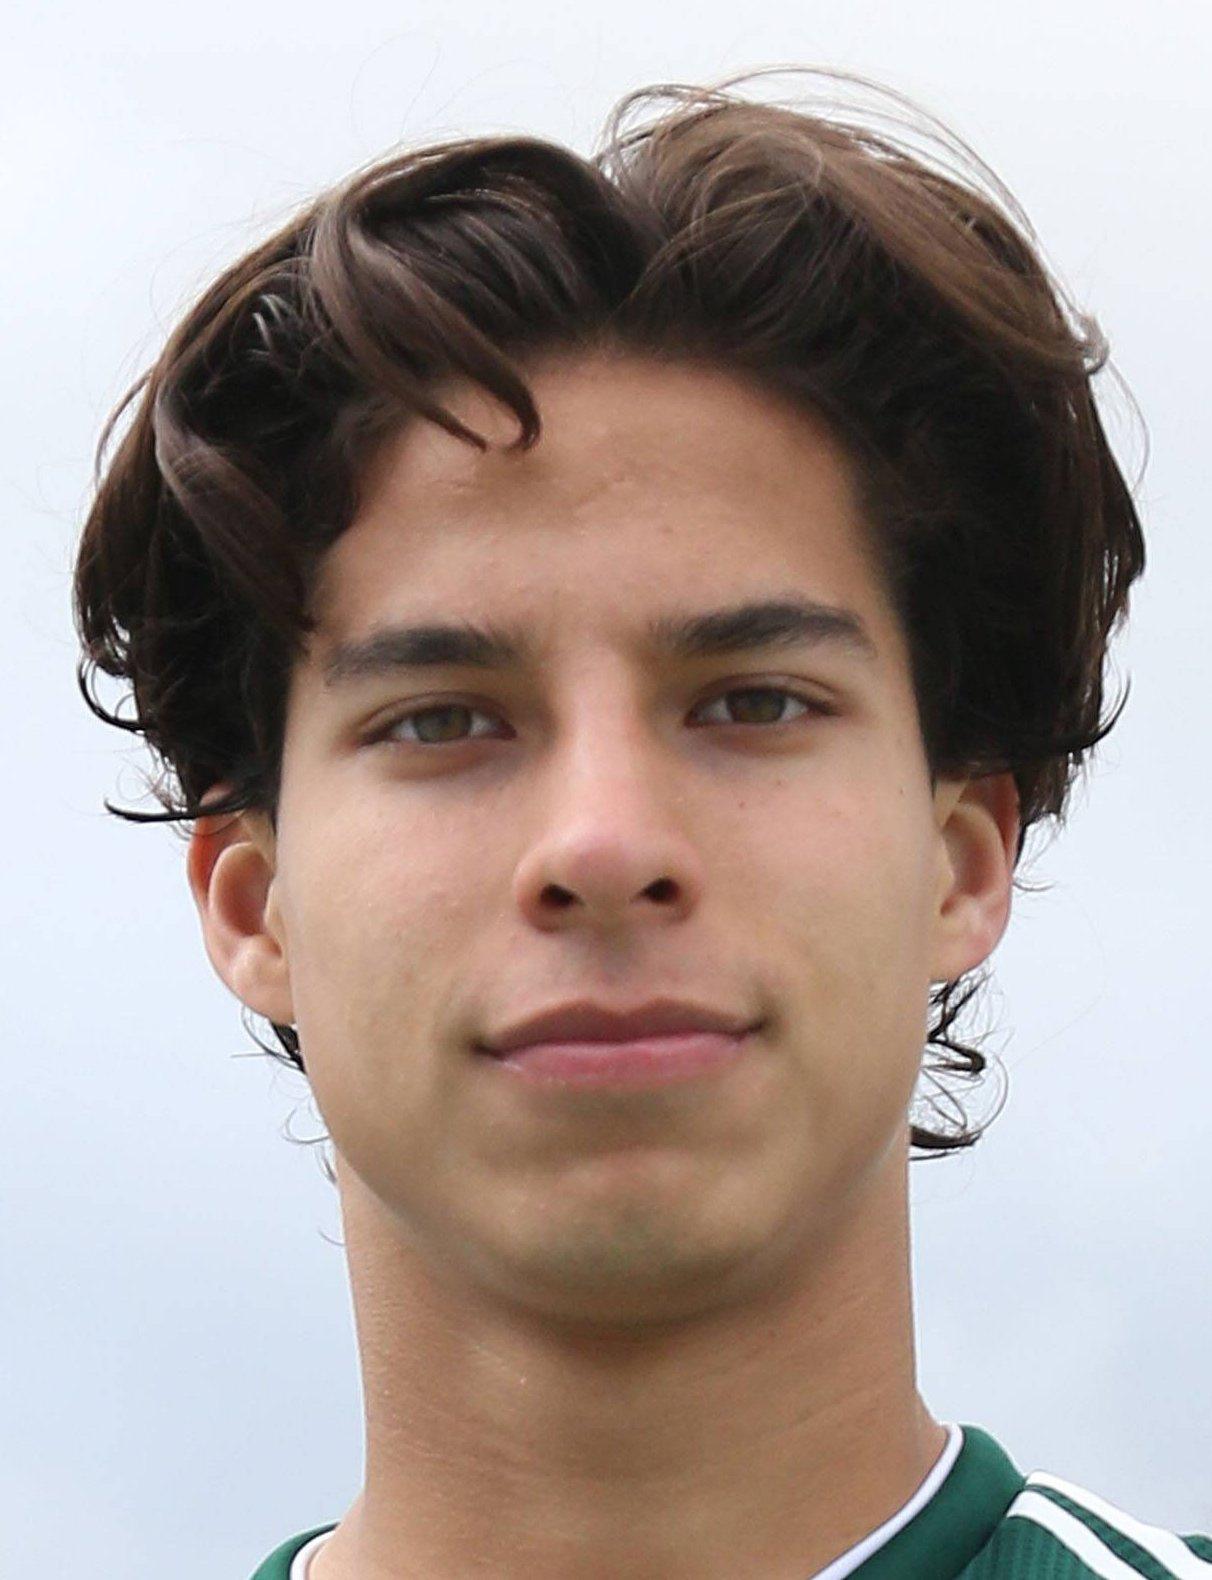 new concept ada63 d7d94 Diego Lainez - Player profile 19/20 | Transfermarkt